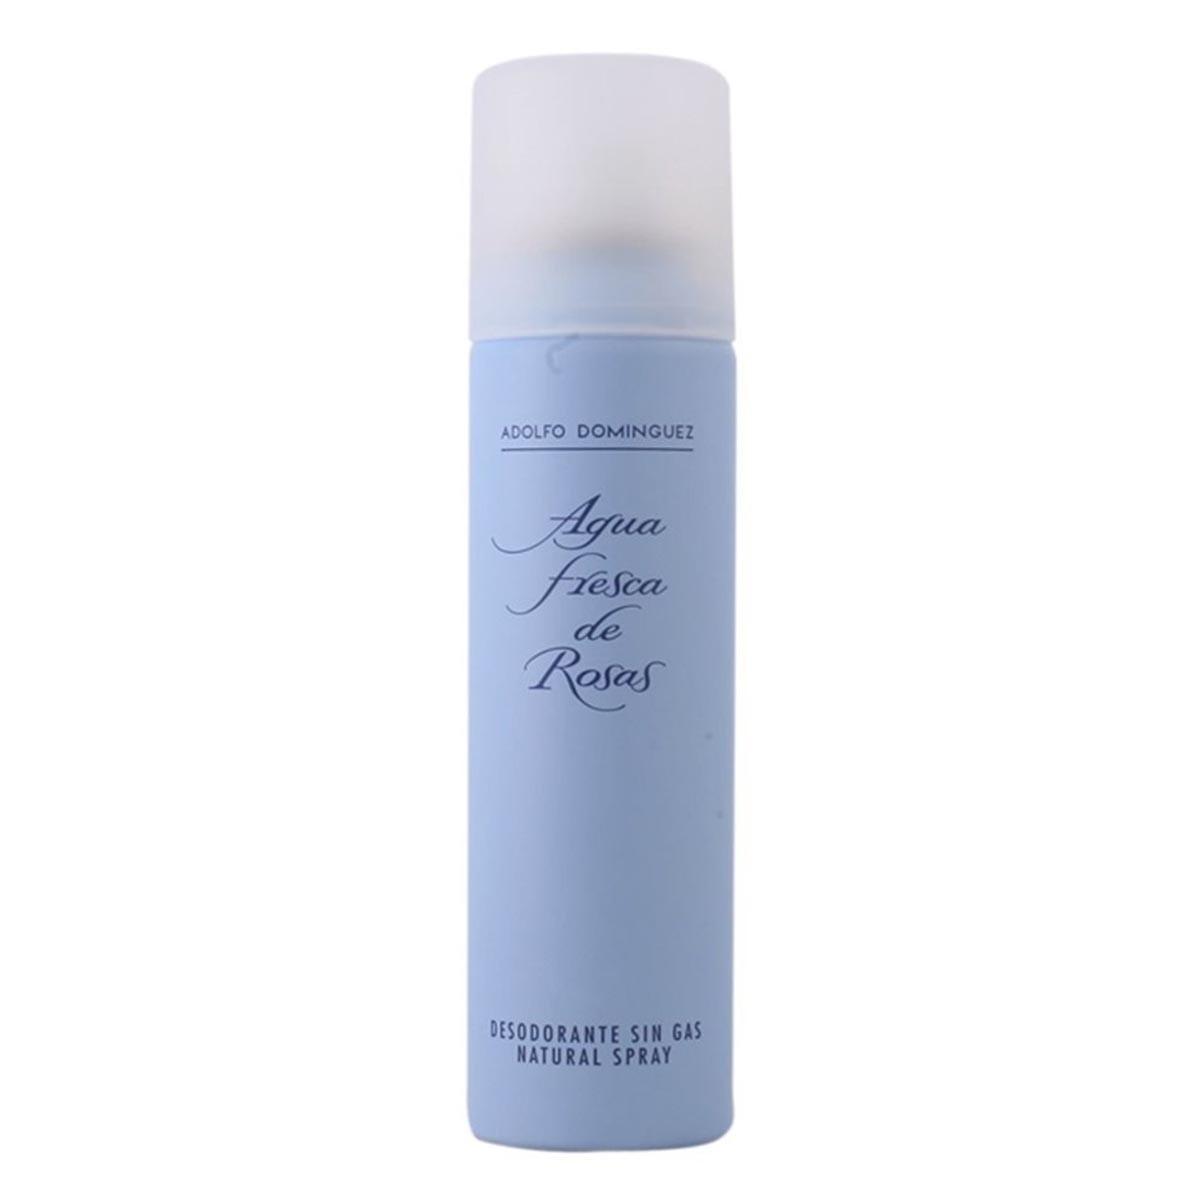 Adolfo Dominguez Agua Fresca de Rosas Deo  Desodorante 150 ml